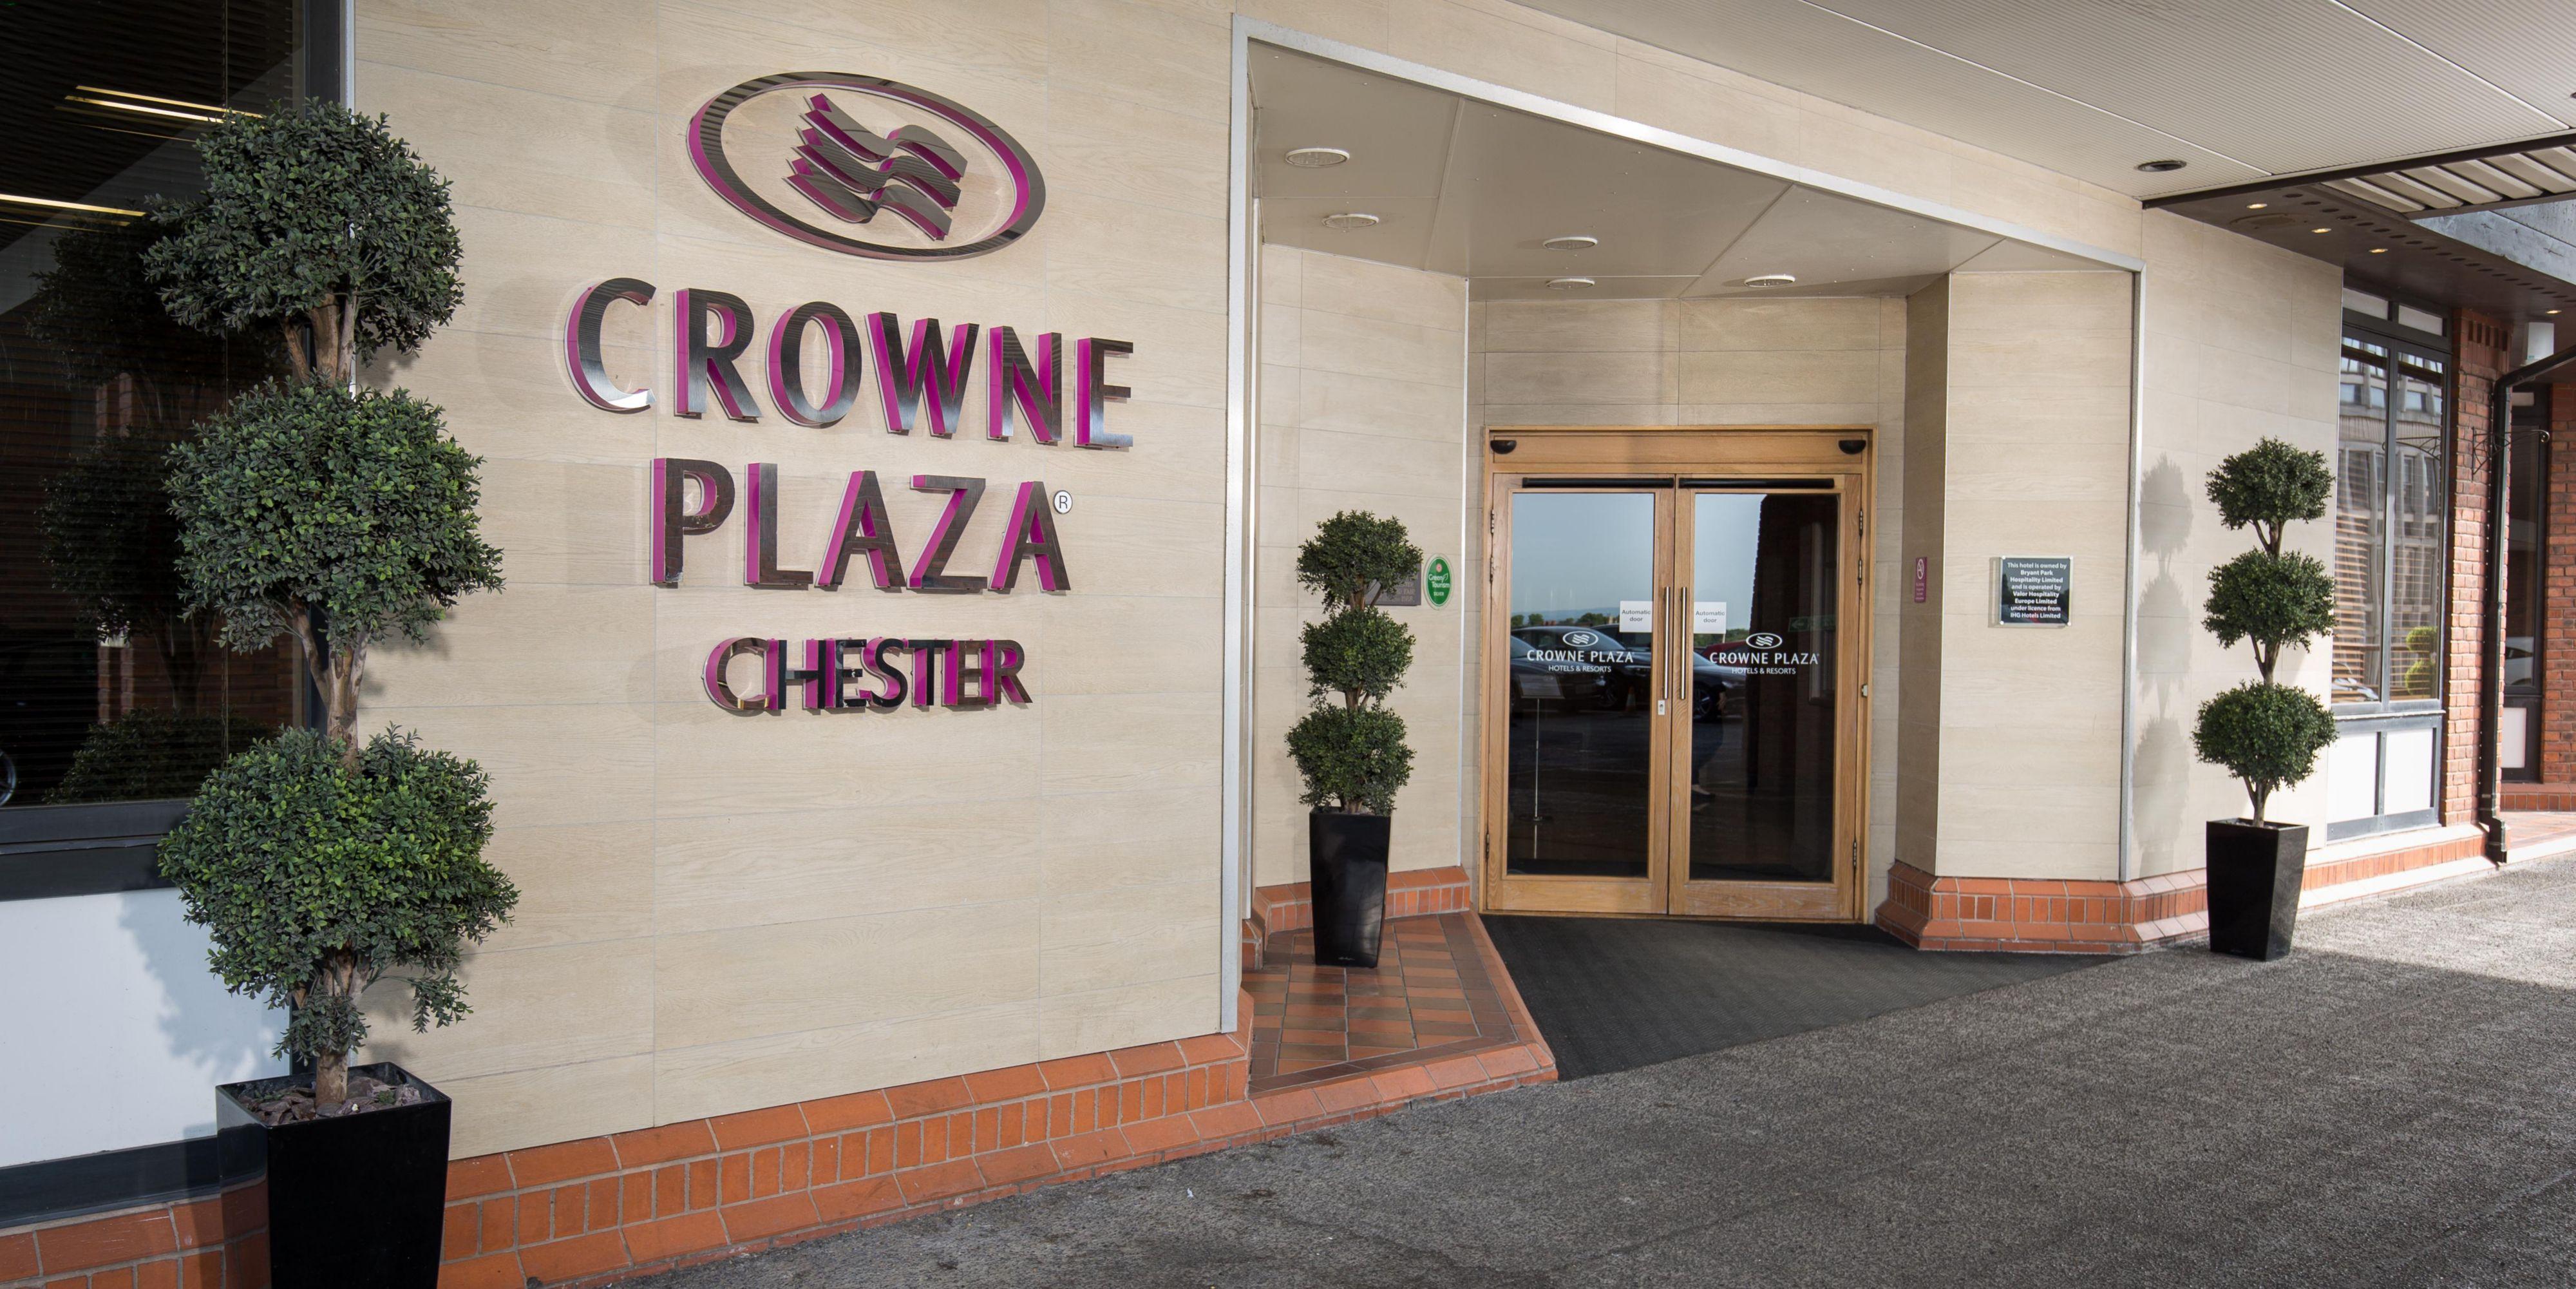 Crowne Plaza exterior